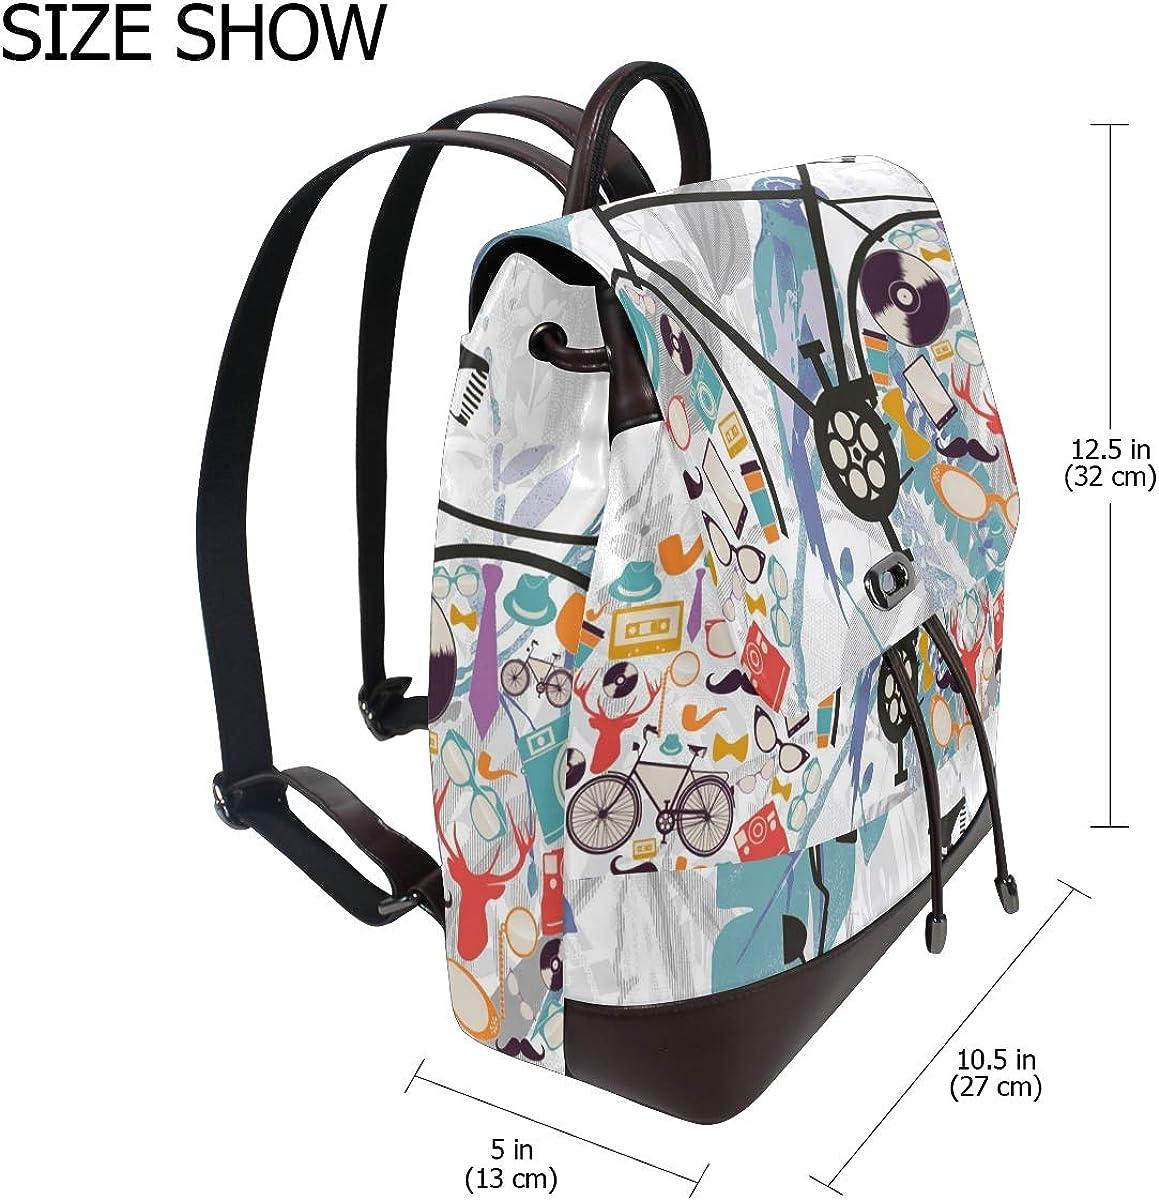 PU Leather Shoulder Bag,Excellent Bike Wheel Backpack,Portable Travel School Rucksack,Satchel with Top Handle